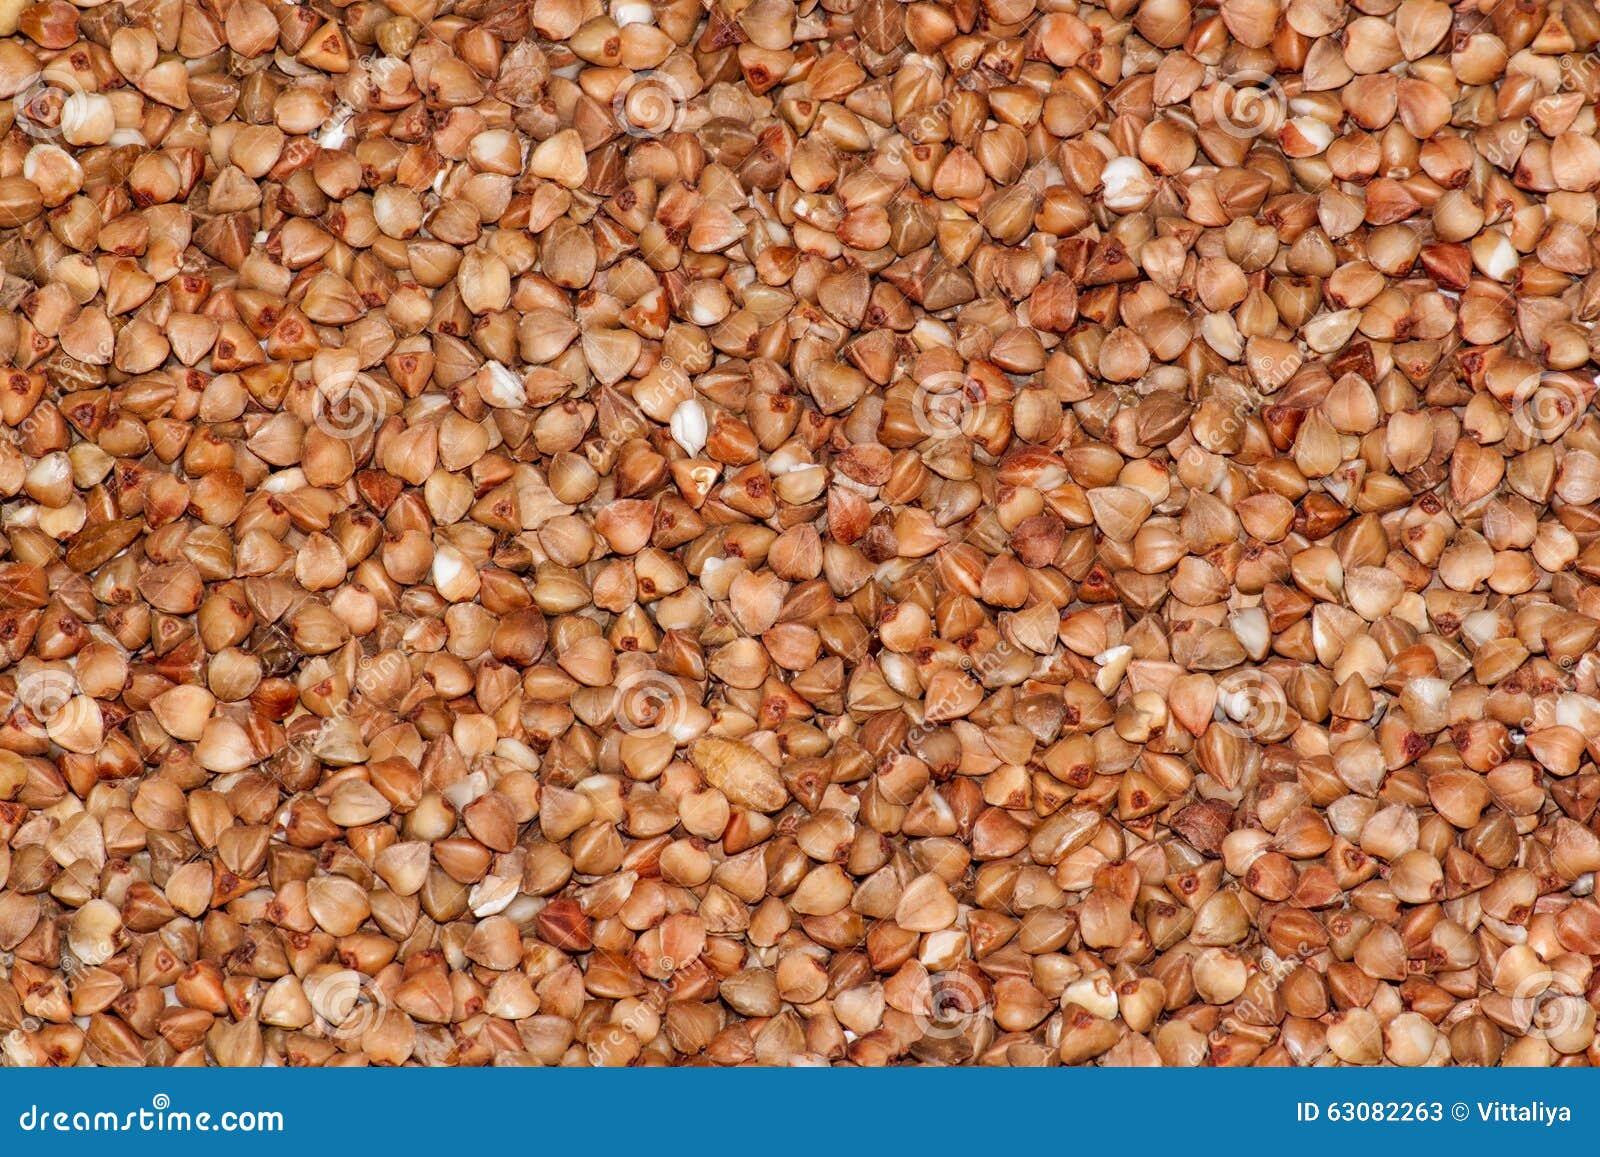 Download Gruau cru de sarrasin image stock. Image du éclailles - 63082263